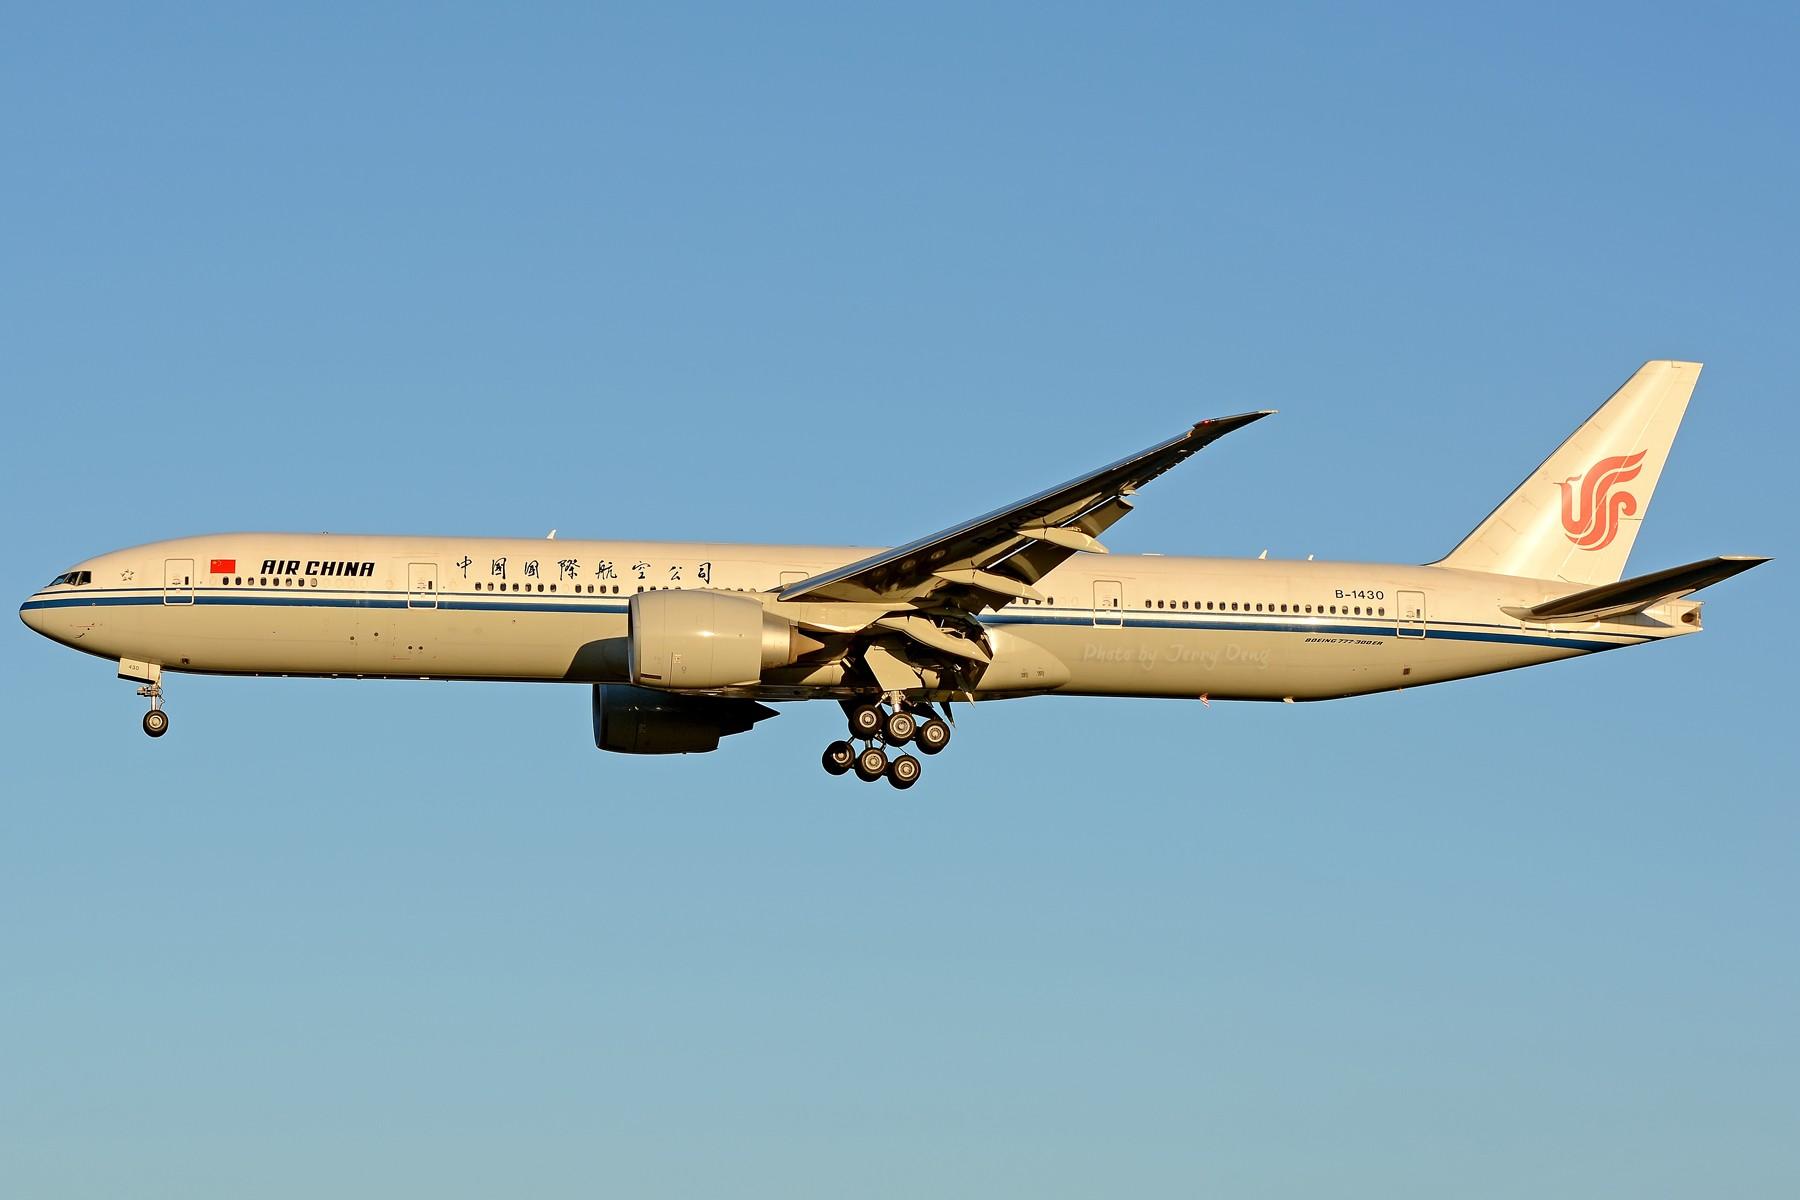 Re:[原创]【多图党】PEK落地一组国航系【2】 BOEING 777-300ER B-1430 中国北京首都国际机场